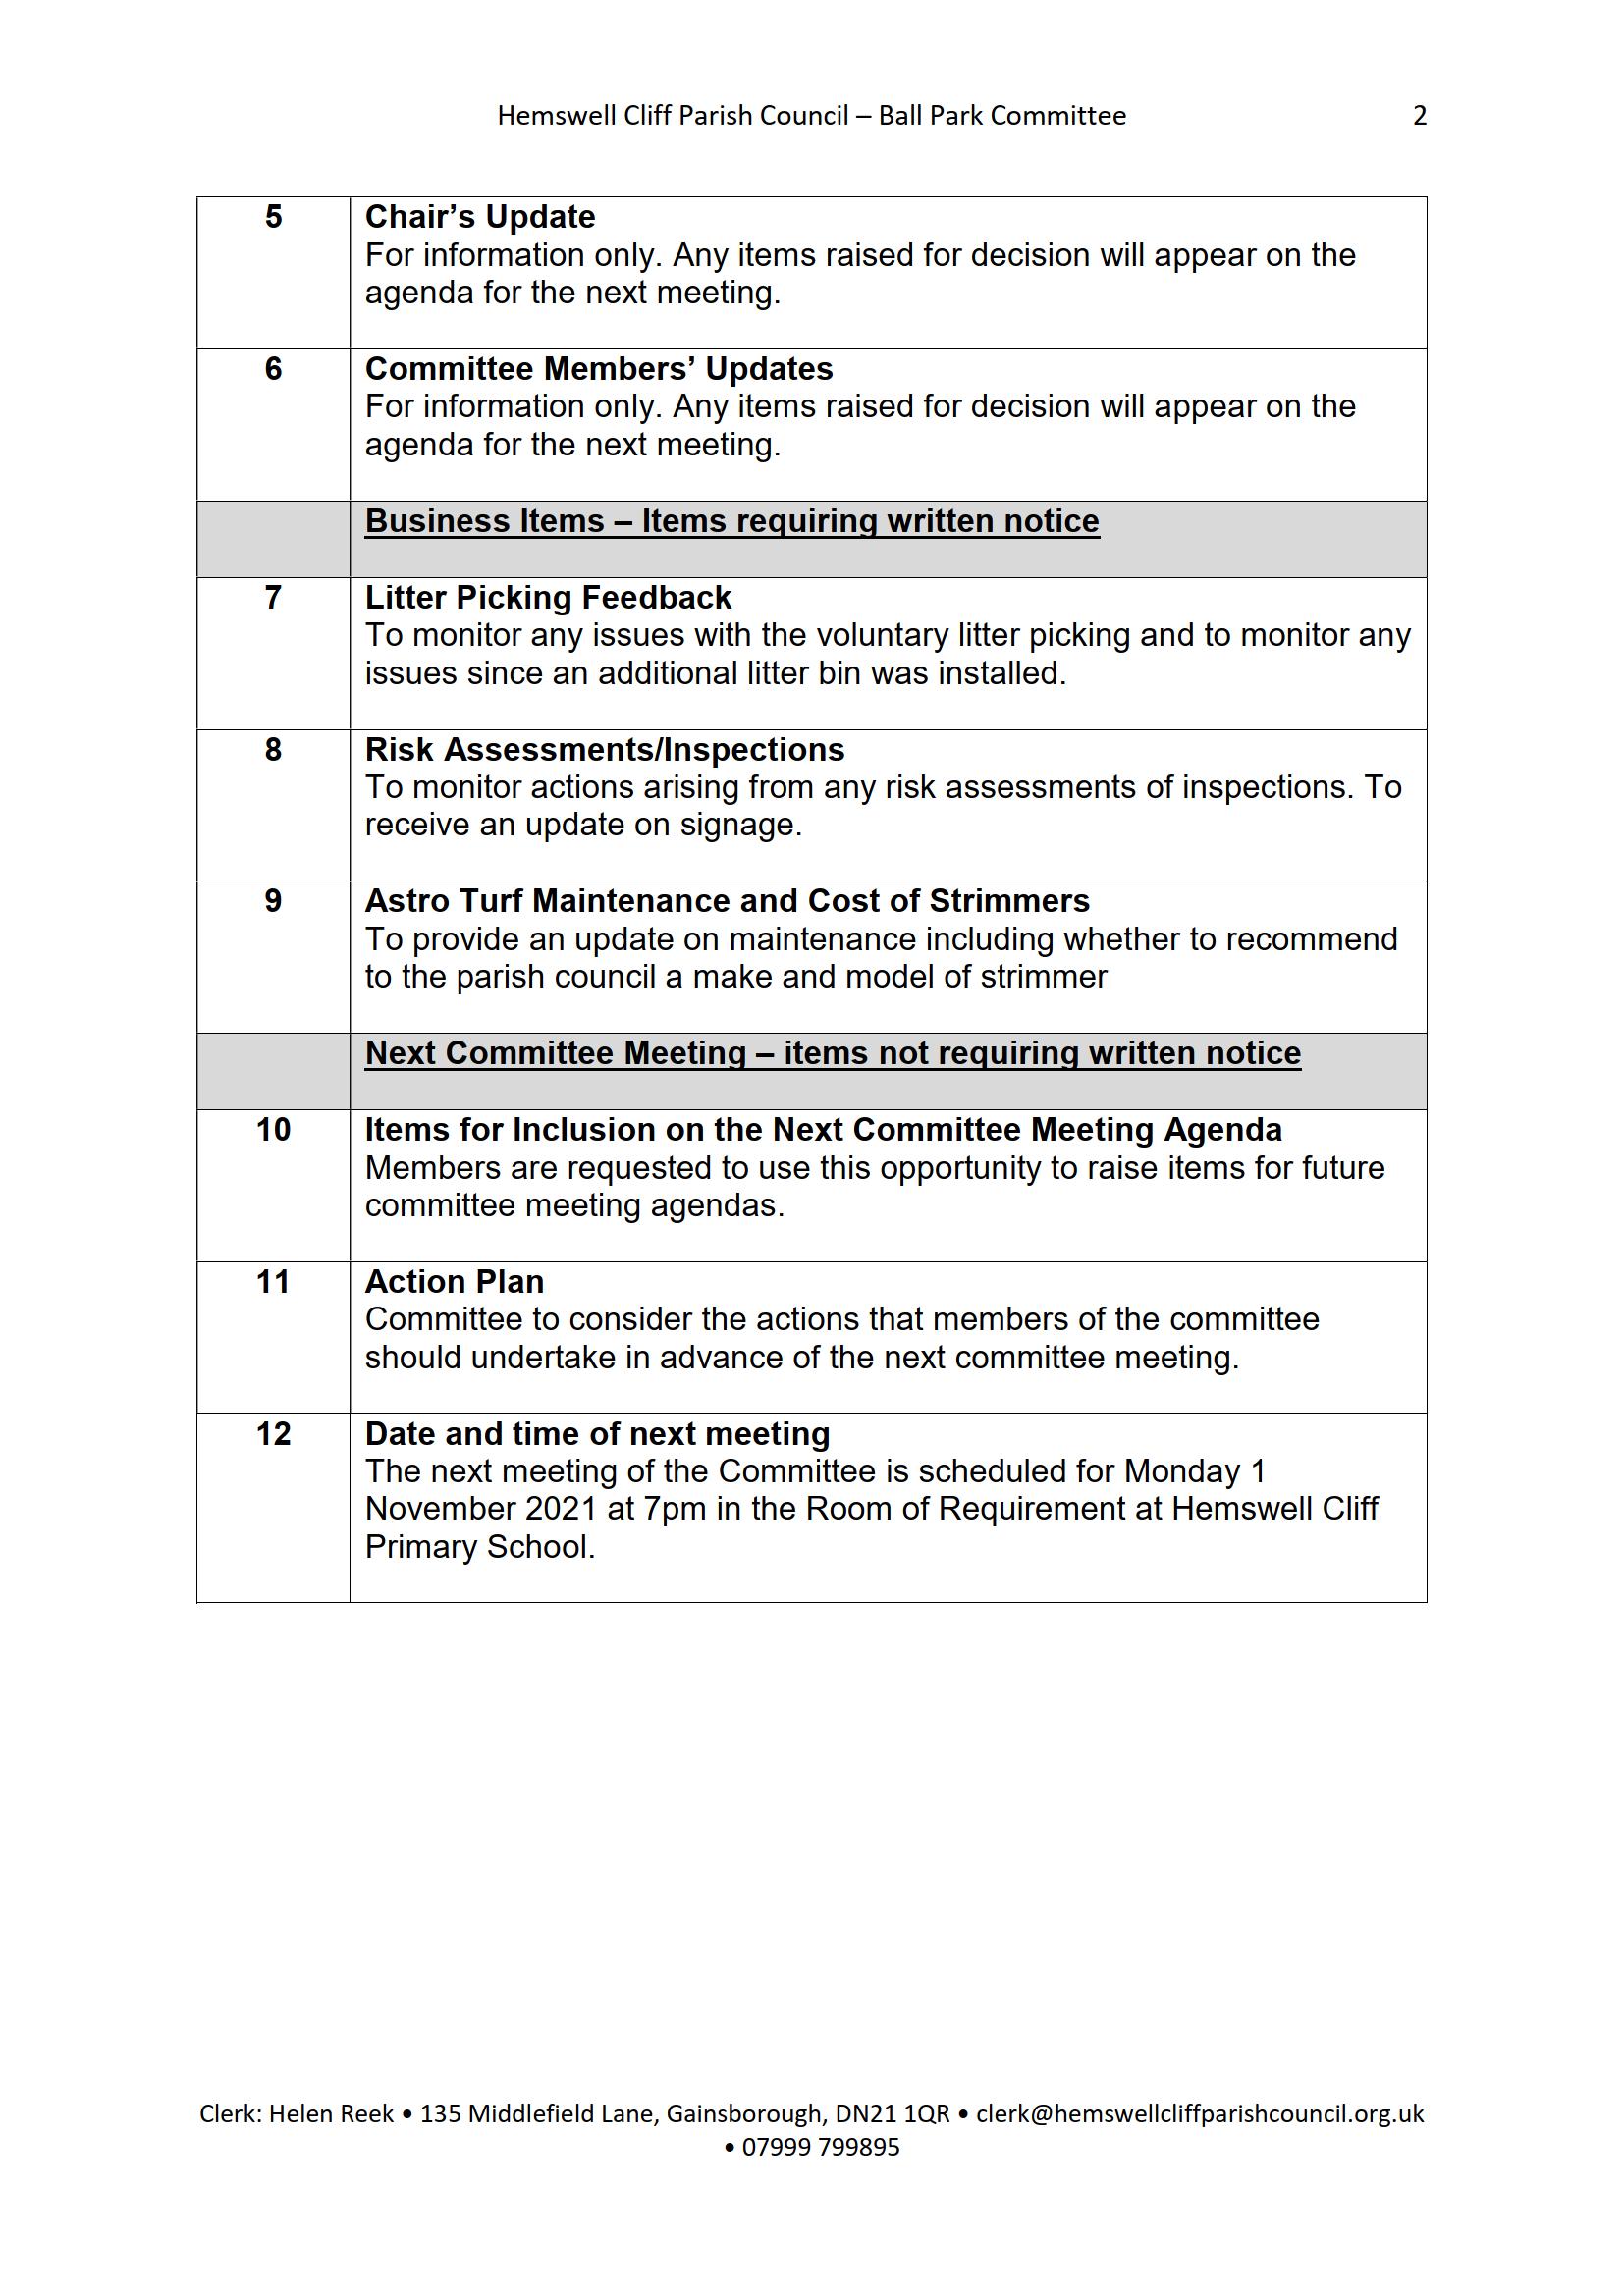 HCPC_BallPark_Agenda_06.09.21_2.png